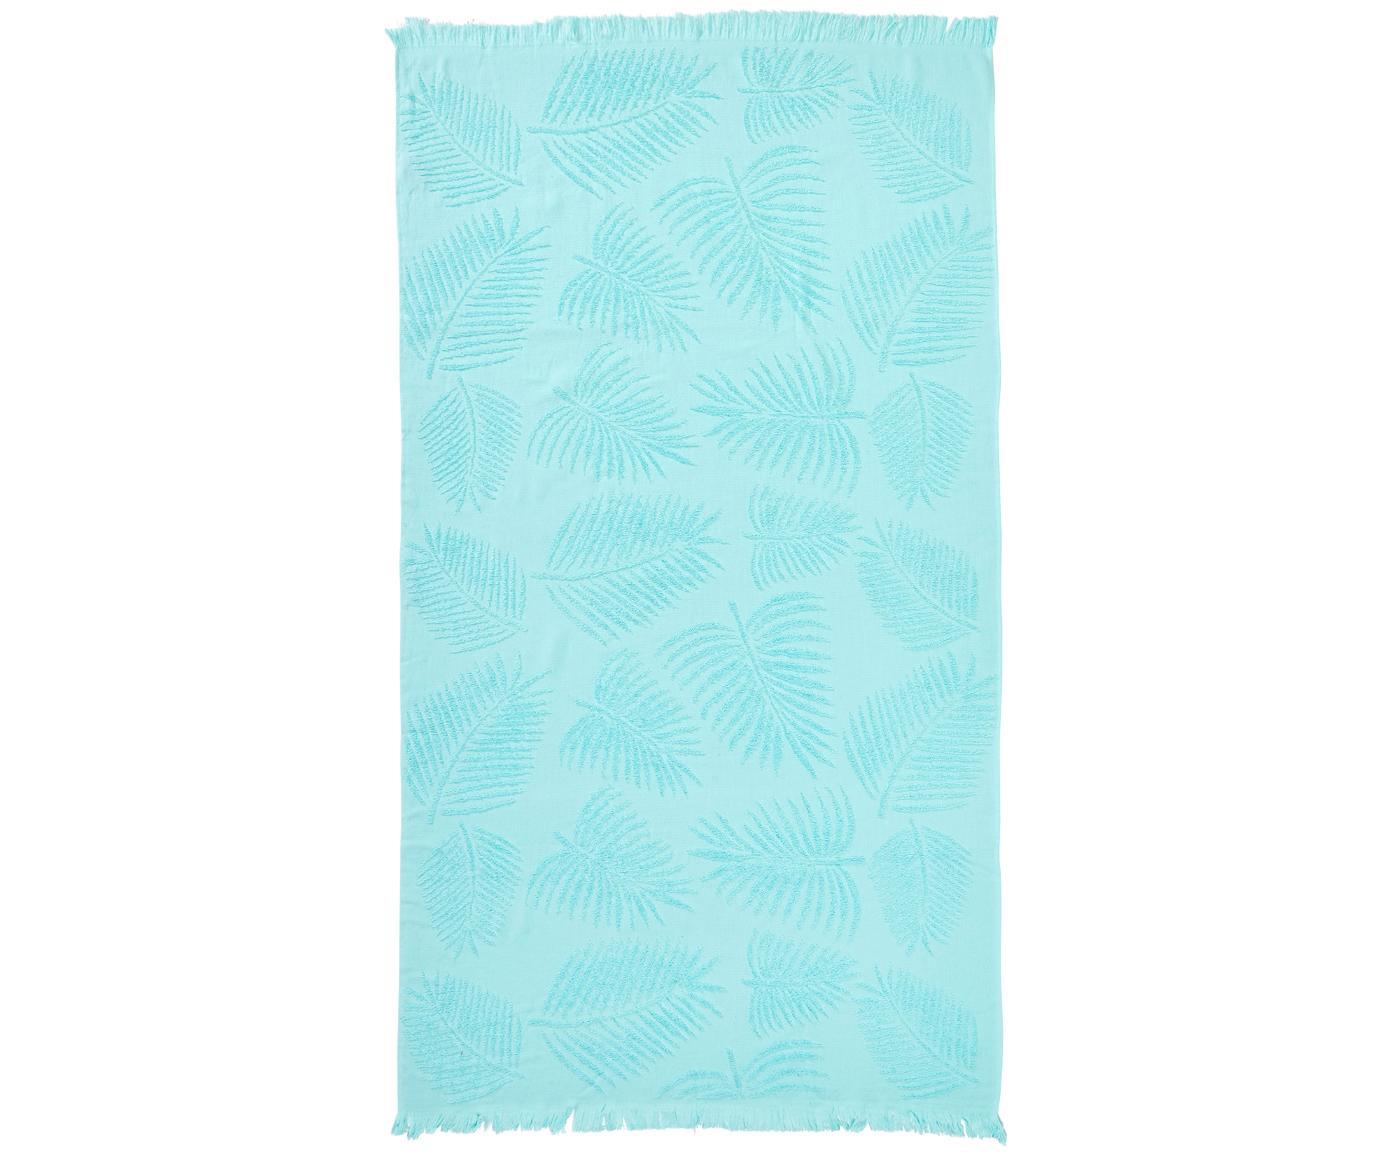 Hamamdoek Capri Palm Leaves, Katoen, lichte kwaliteit, 300 g/m², Turquoise, 90 x 160 cm